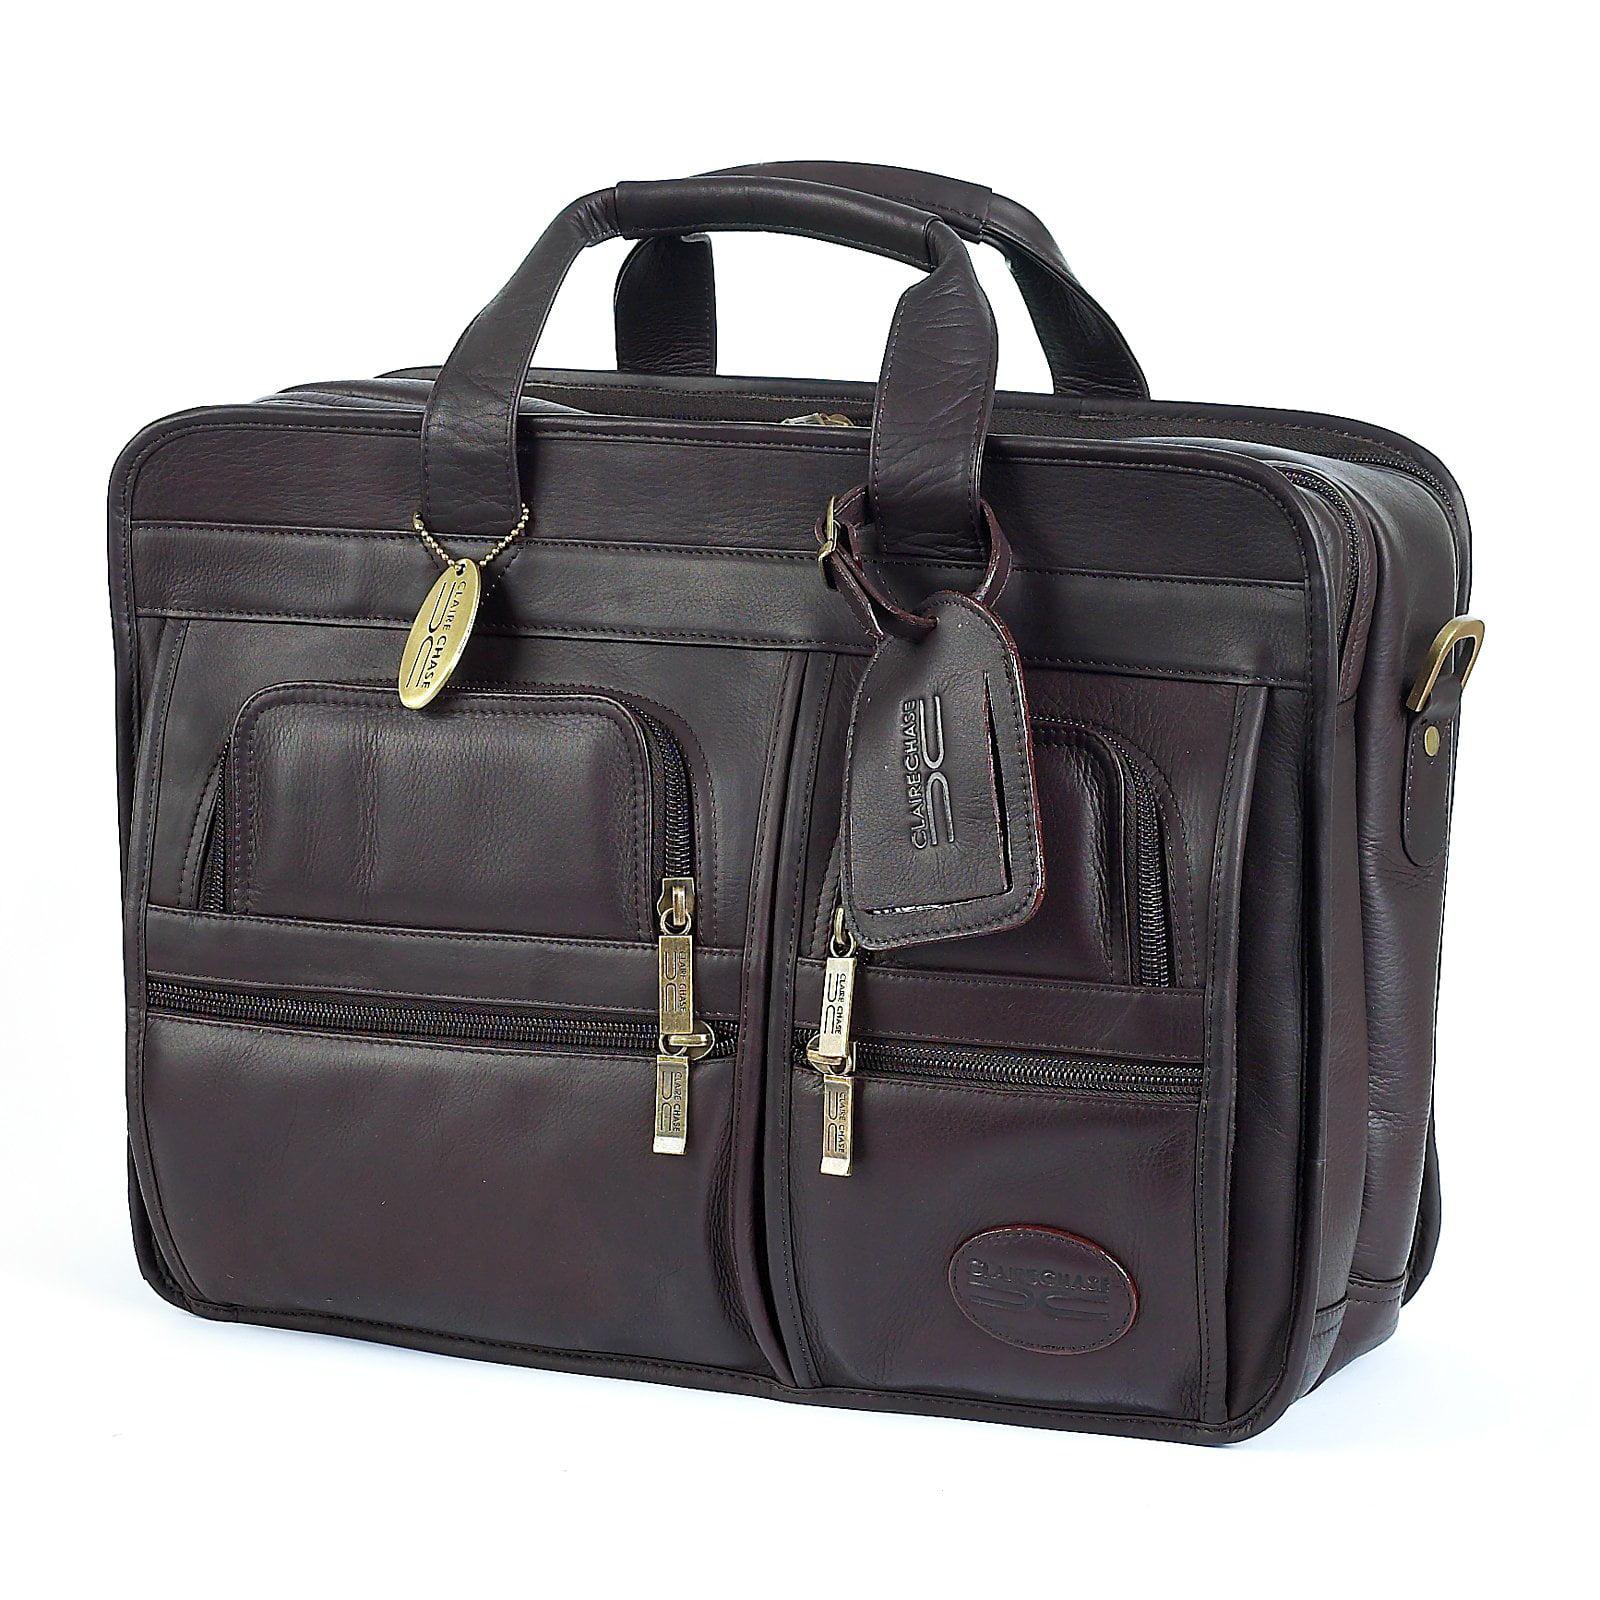 Claire Chase Executive Briefcase